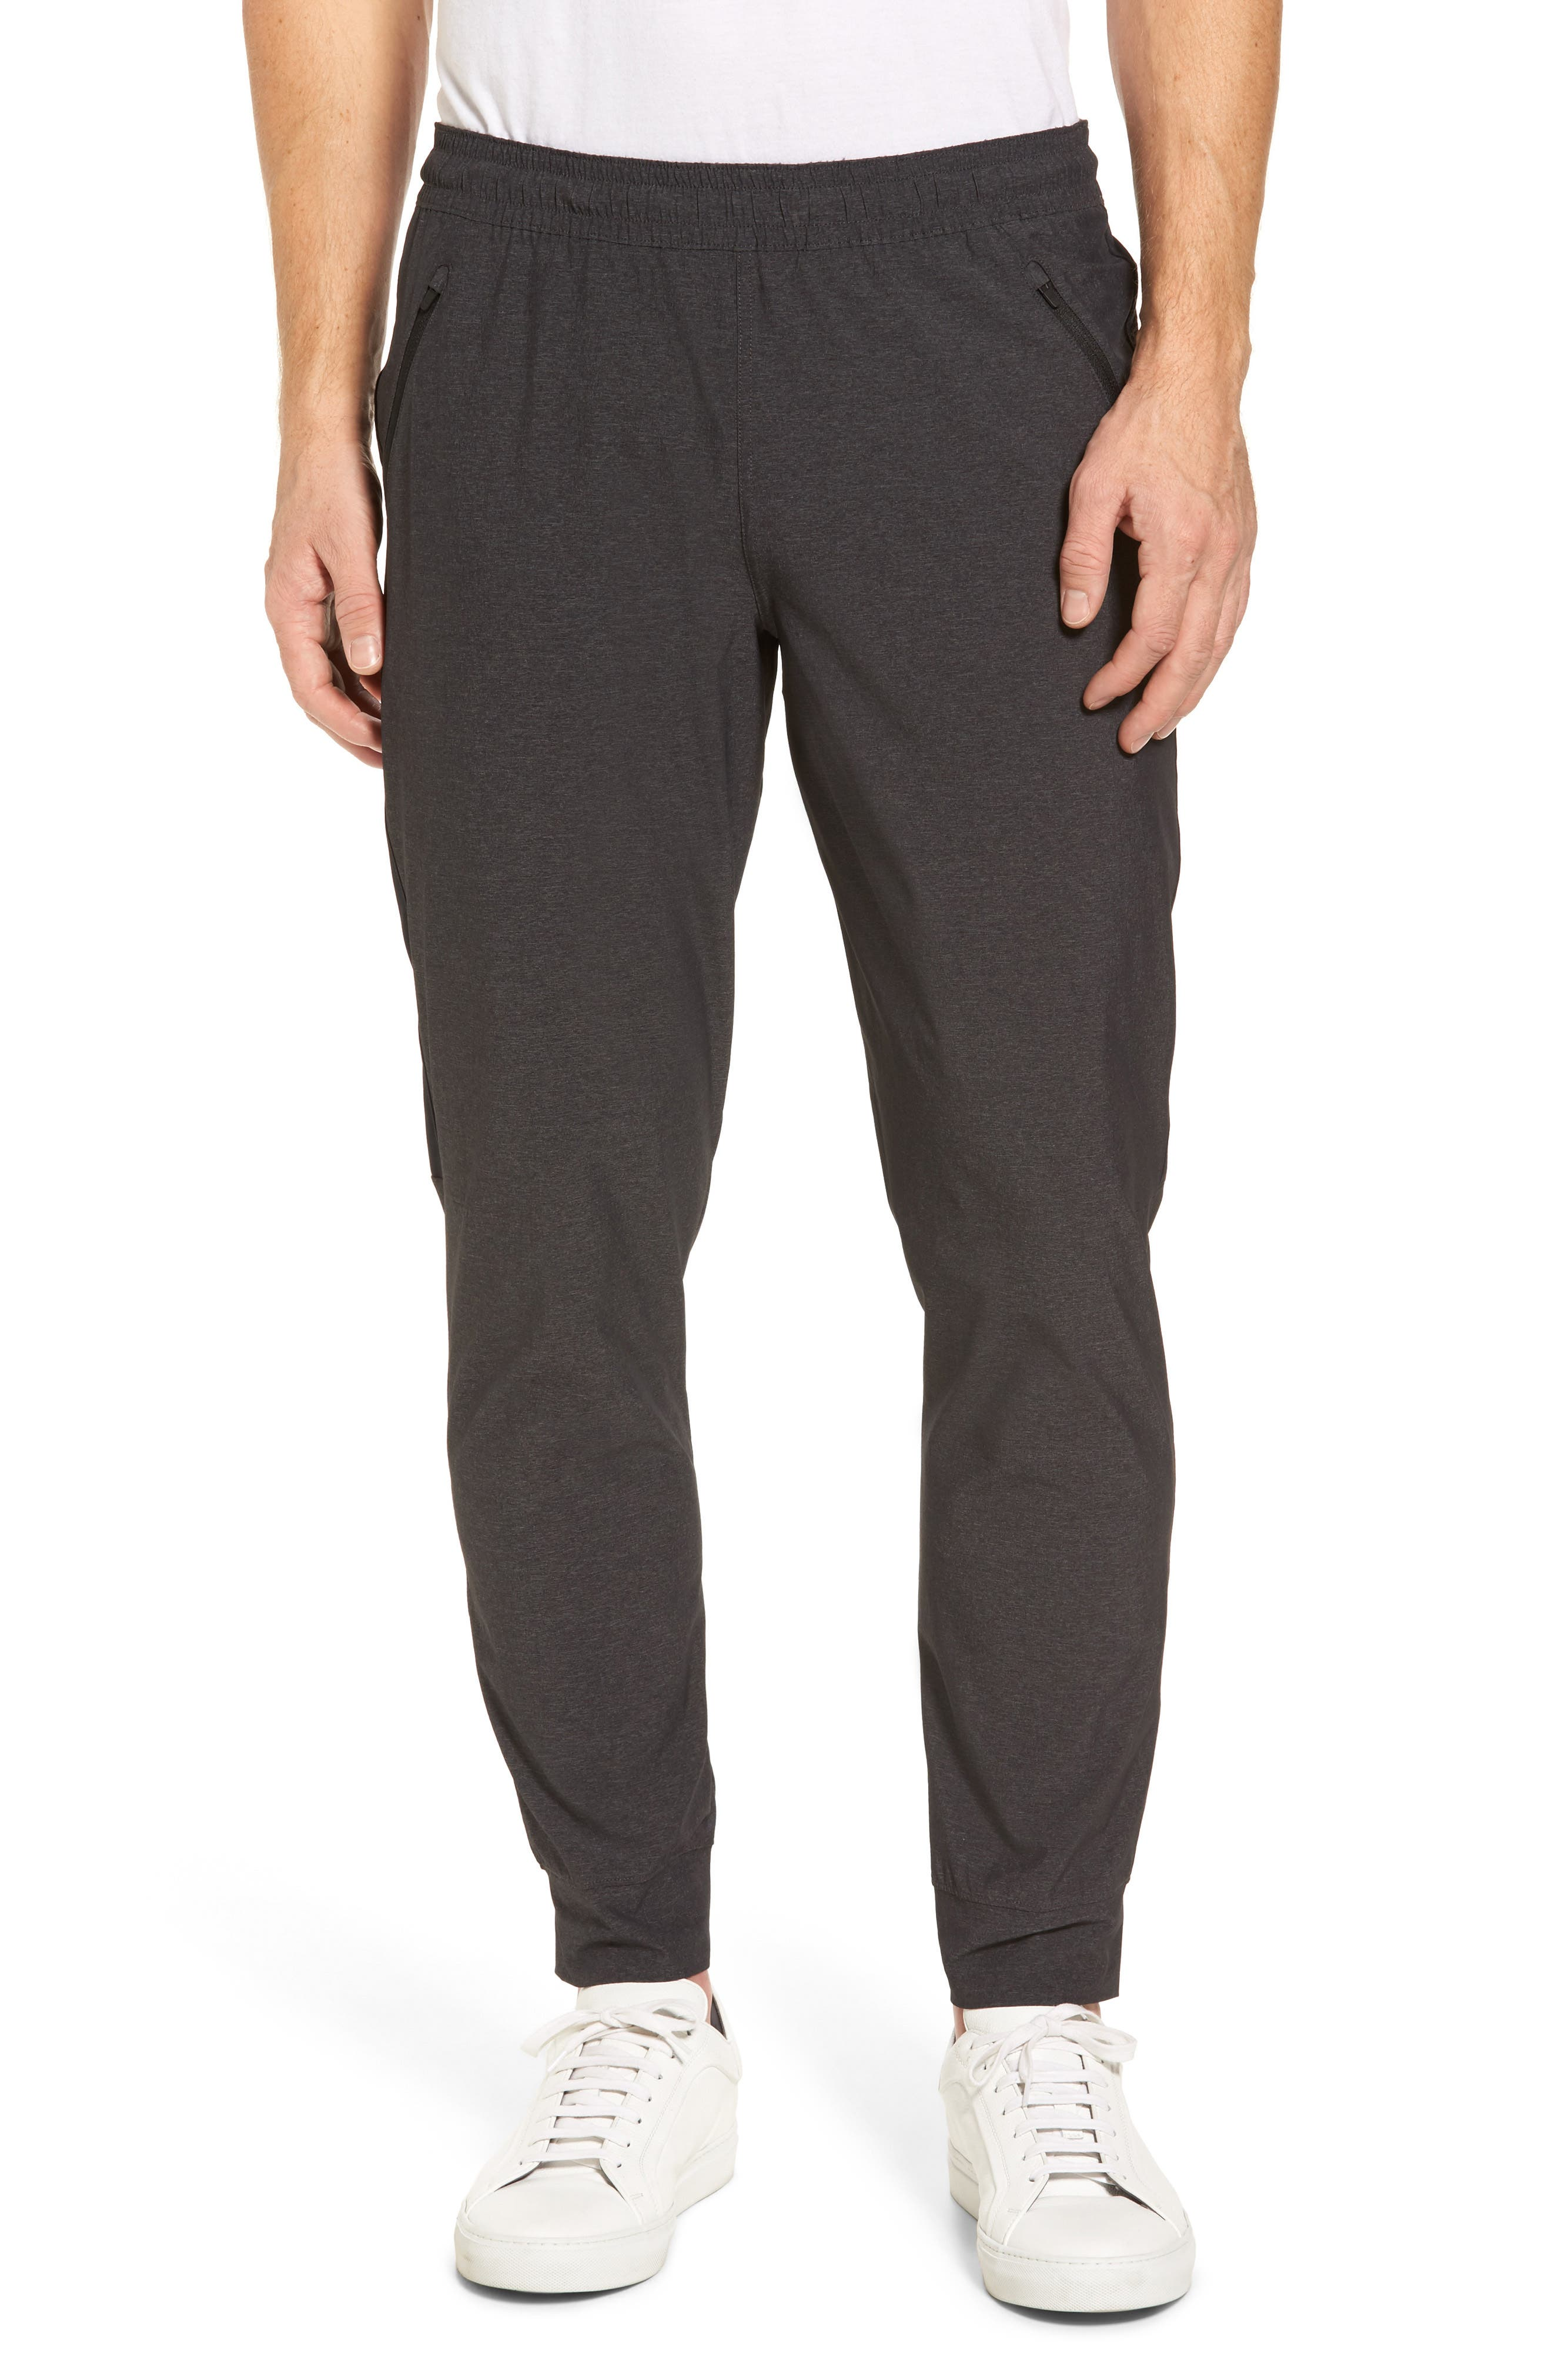 Zip Pocket Sweatpants,                             Main thumbnail 1, color,                             021